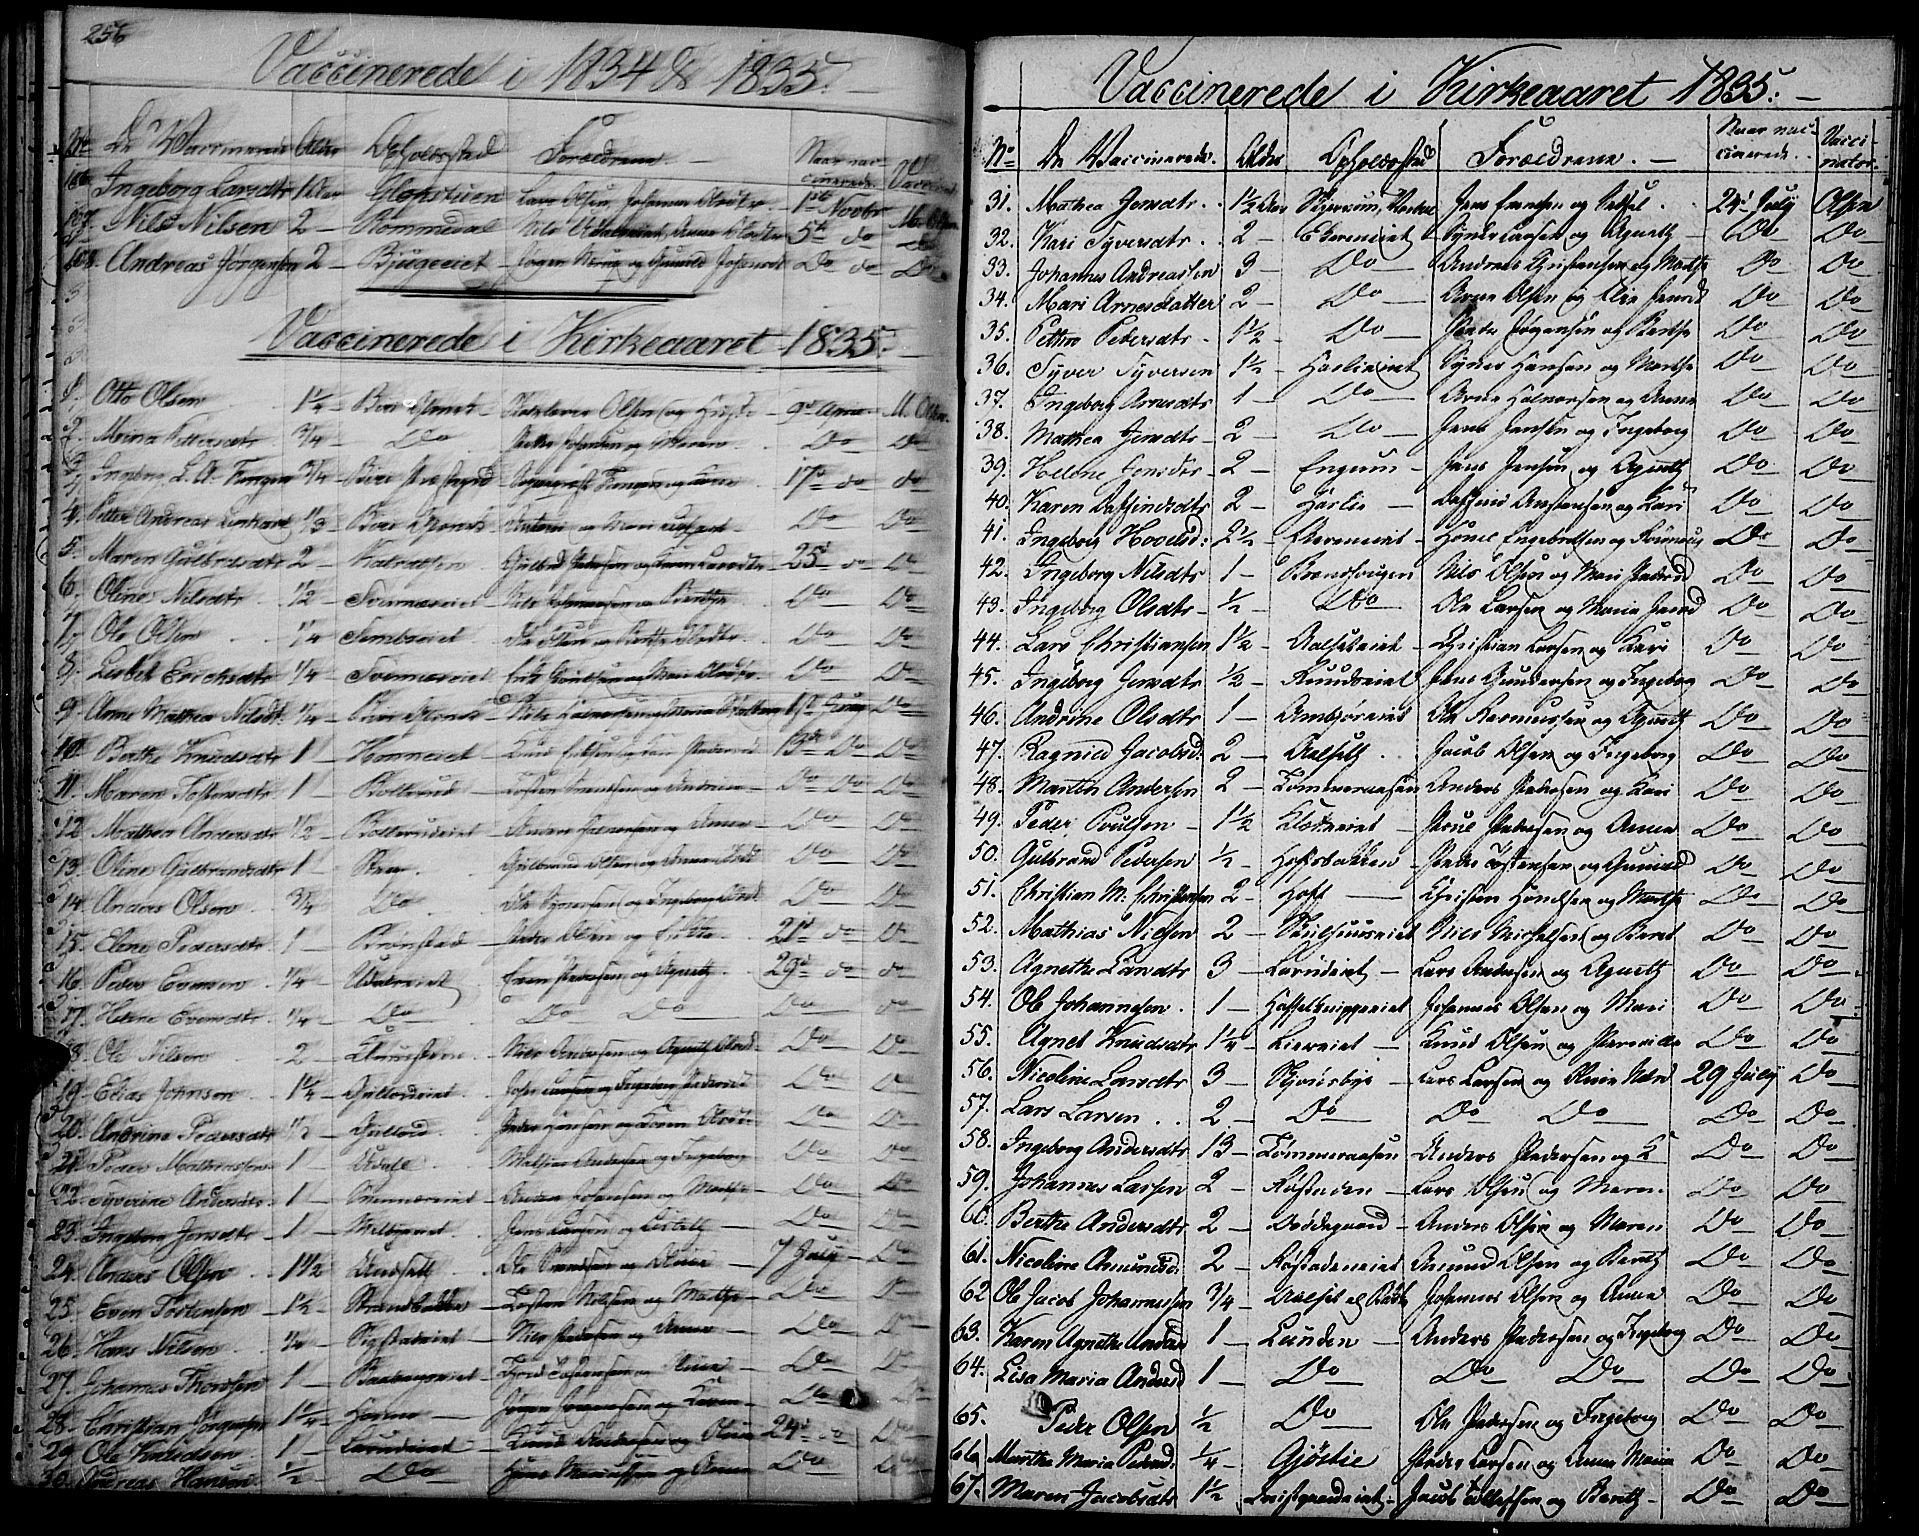 SAH, Biri prestekontor, Ministerialbok nr. 4, 1829-1842, s. 256